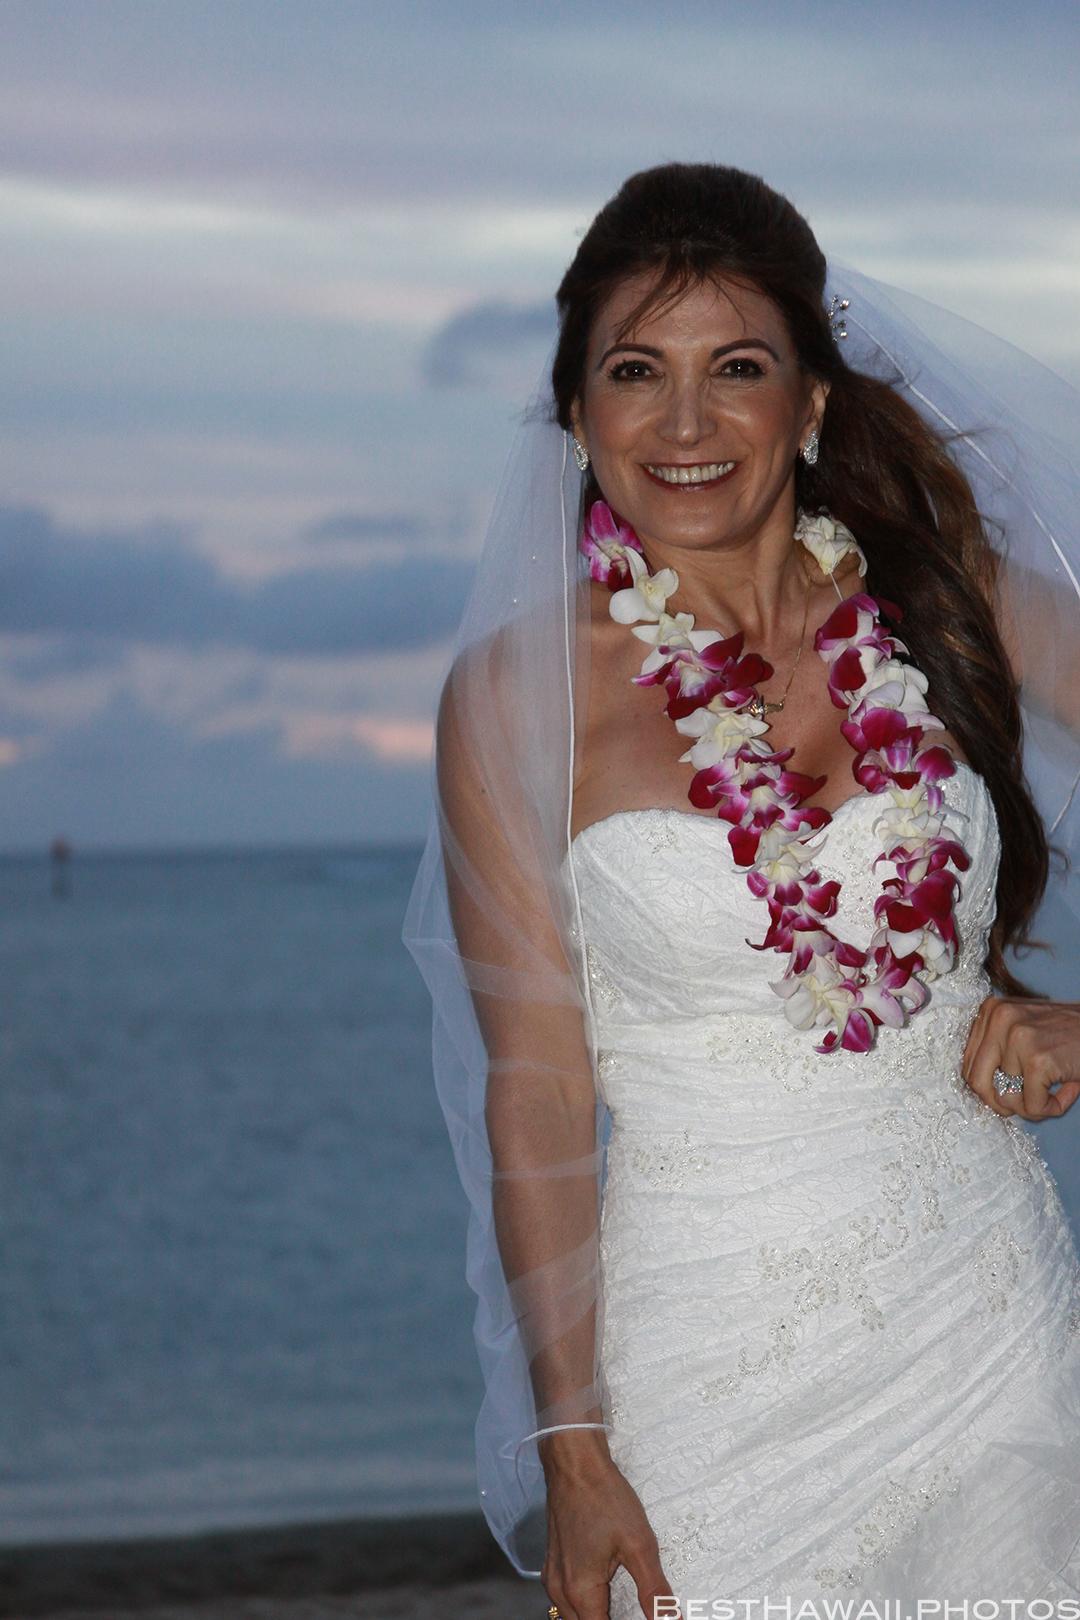 Sunset Wedding Photos in Waikiki by Pasha www.BestHawaii.photos 121820158708